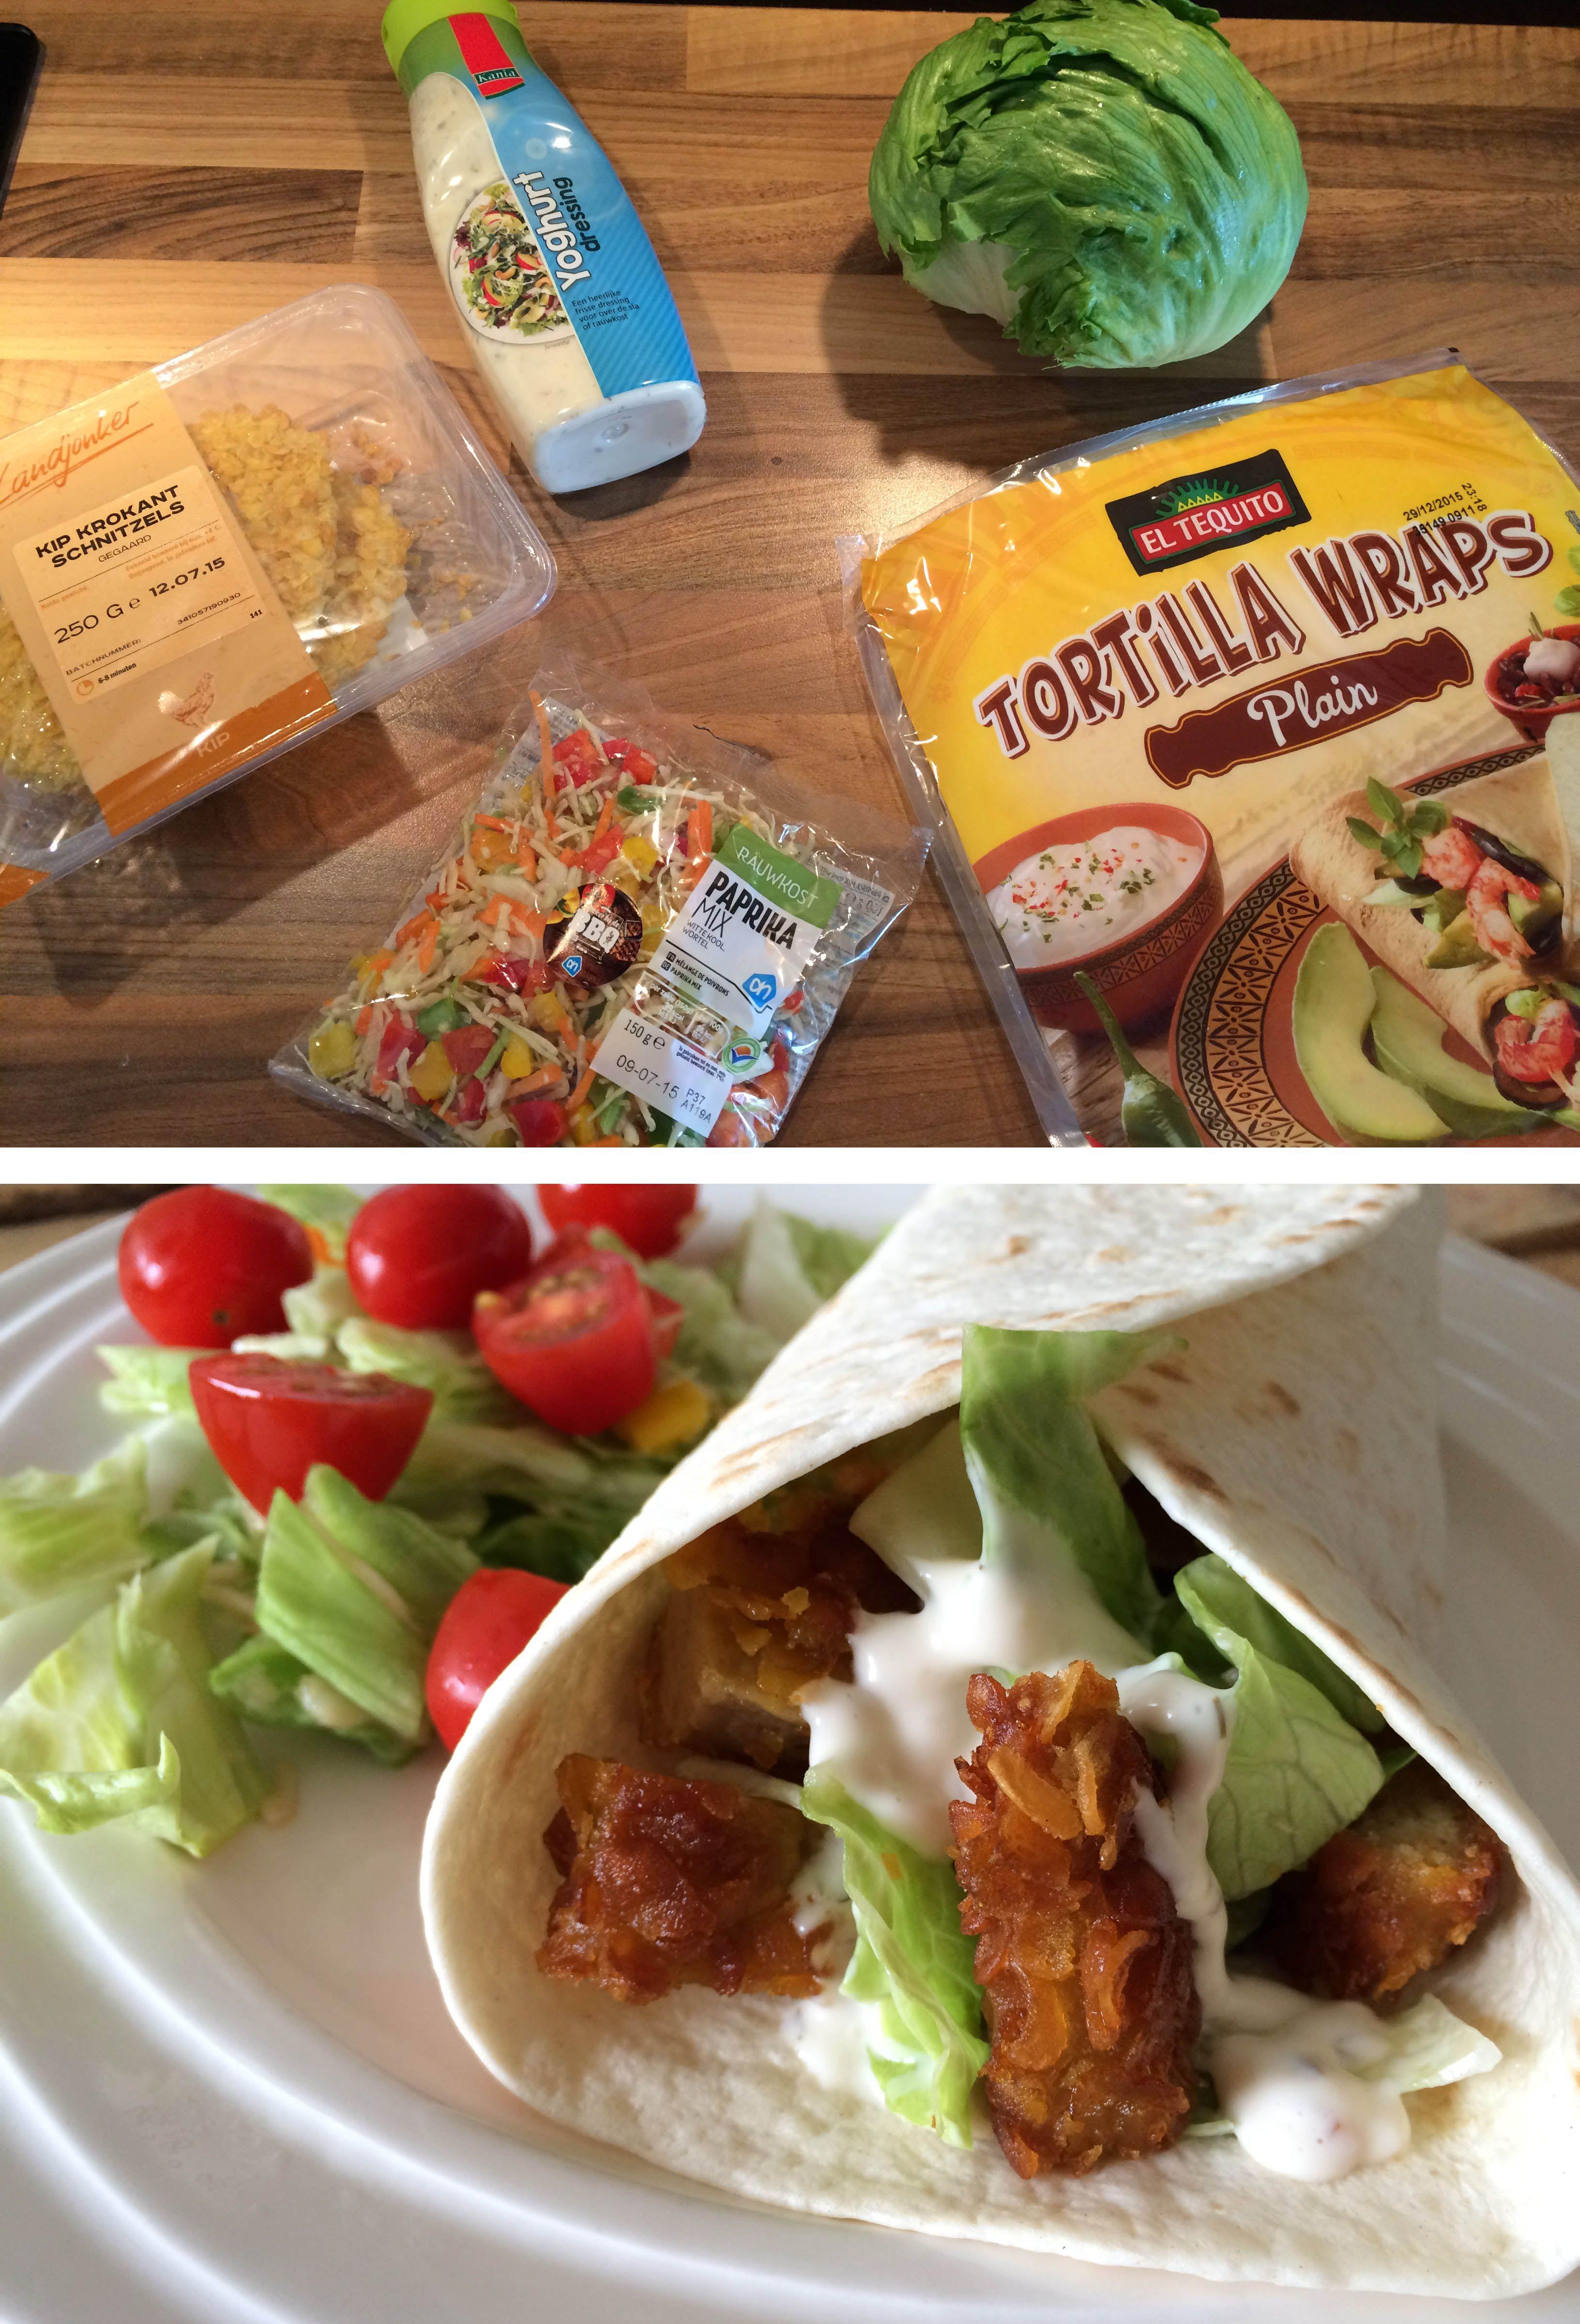 Wonderbaar Wraps met krokante kip | Recept - Lekker eten, Krokante kip en IS-96